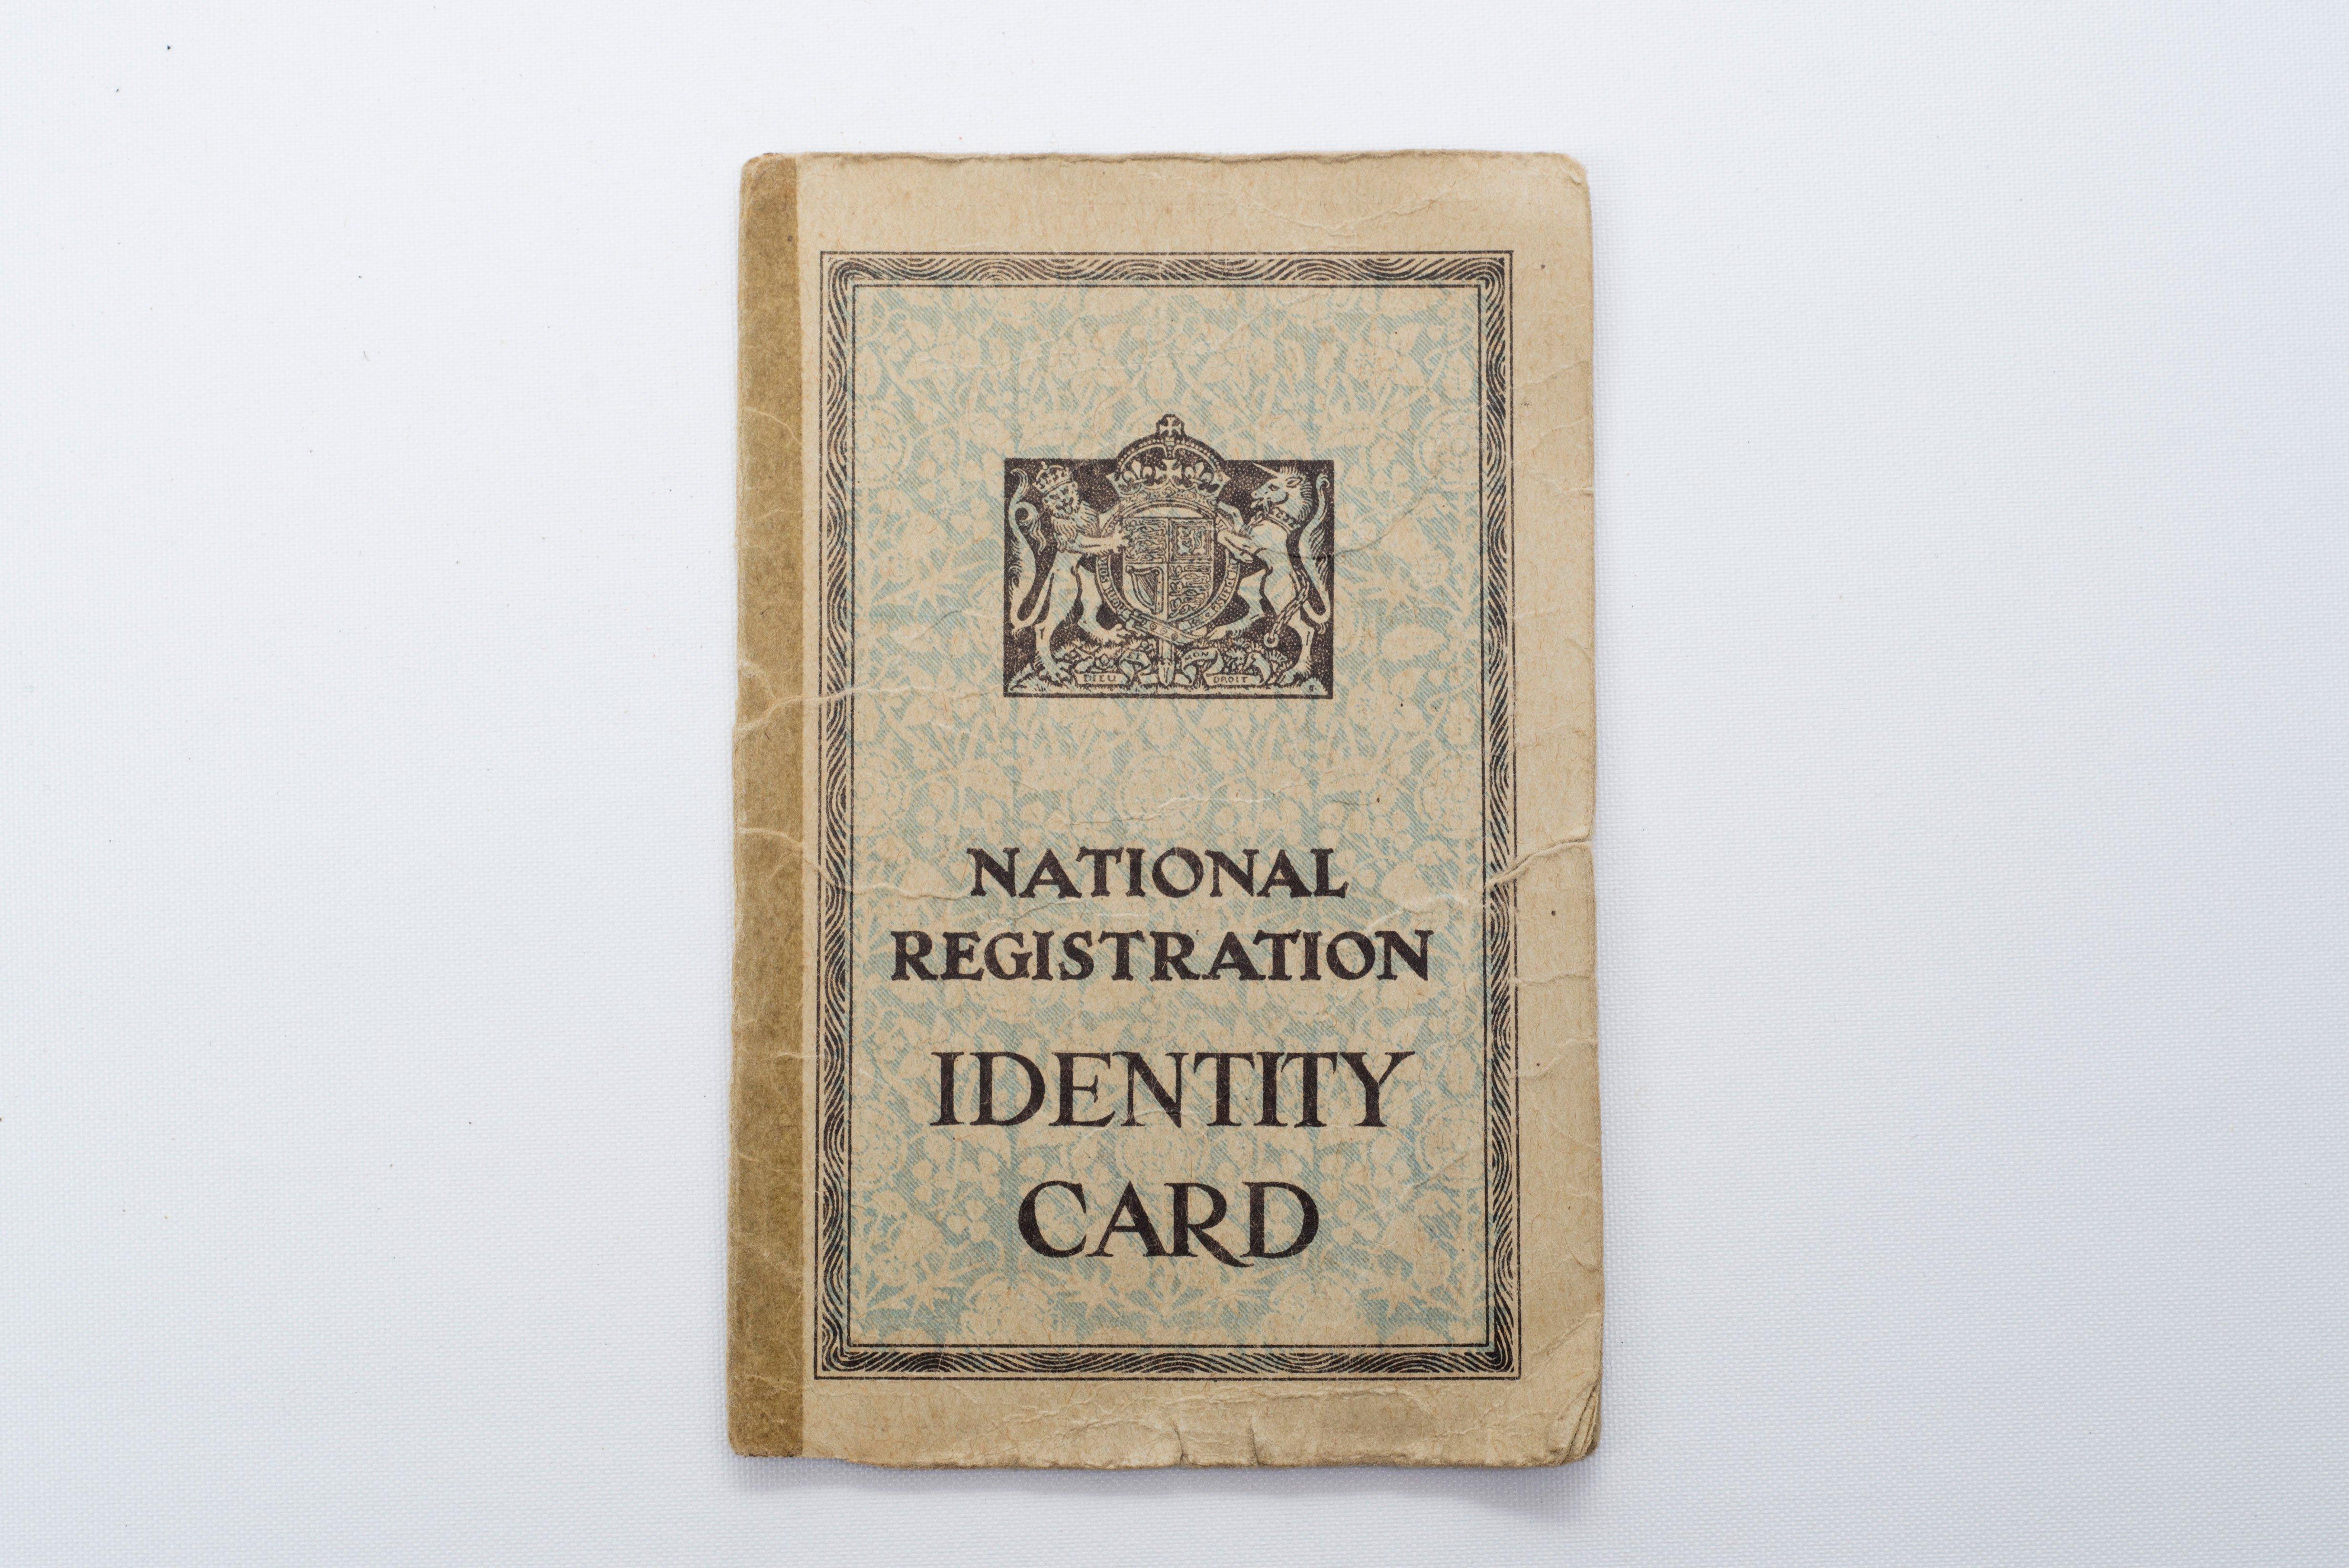 Identity Card – East grinstead Museum